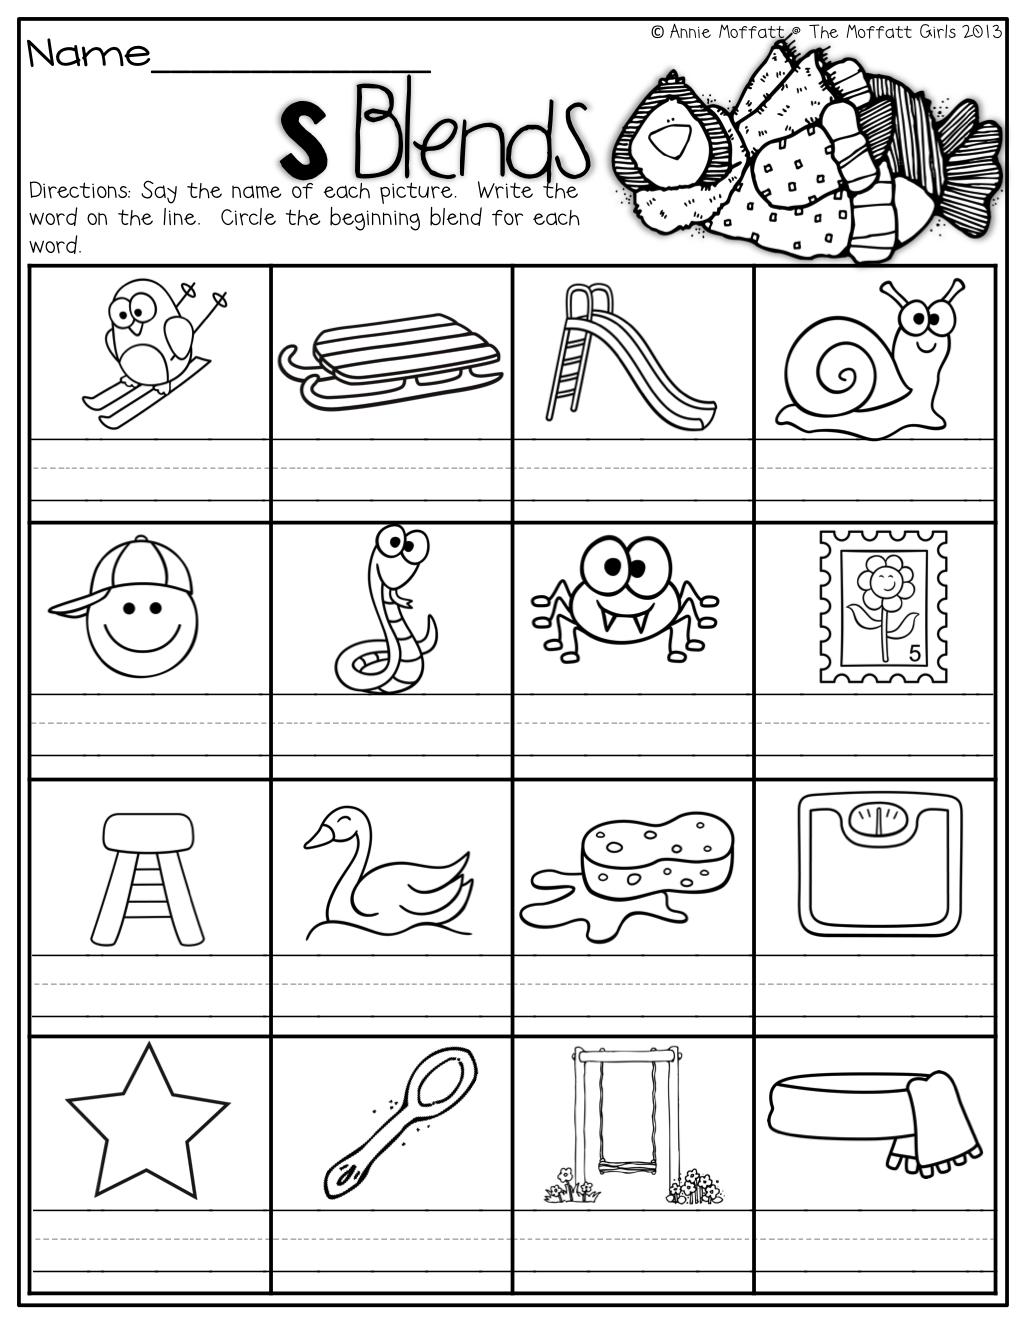 small resolution of The Moffatt Girls: Winter Math and Literacy Packet (First Grade)   Blends  worksheets